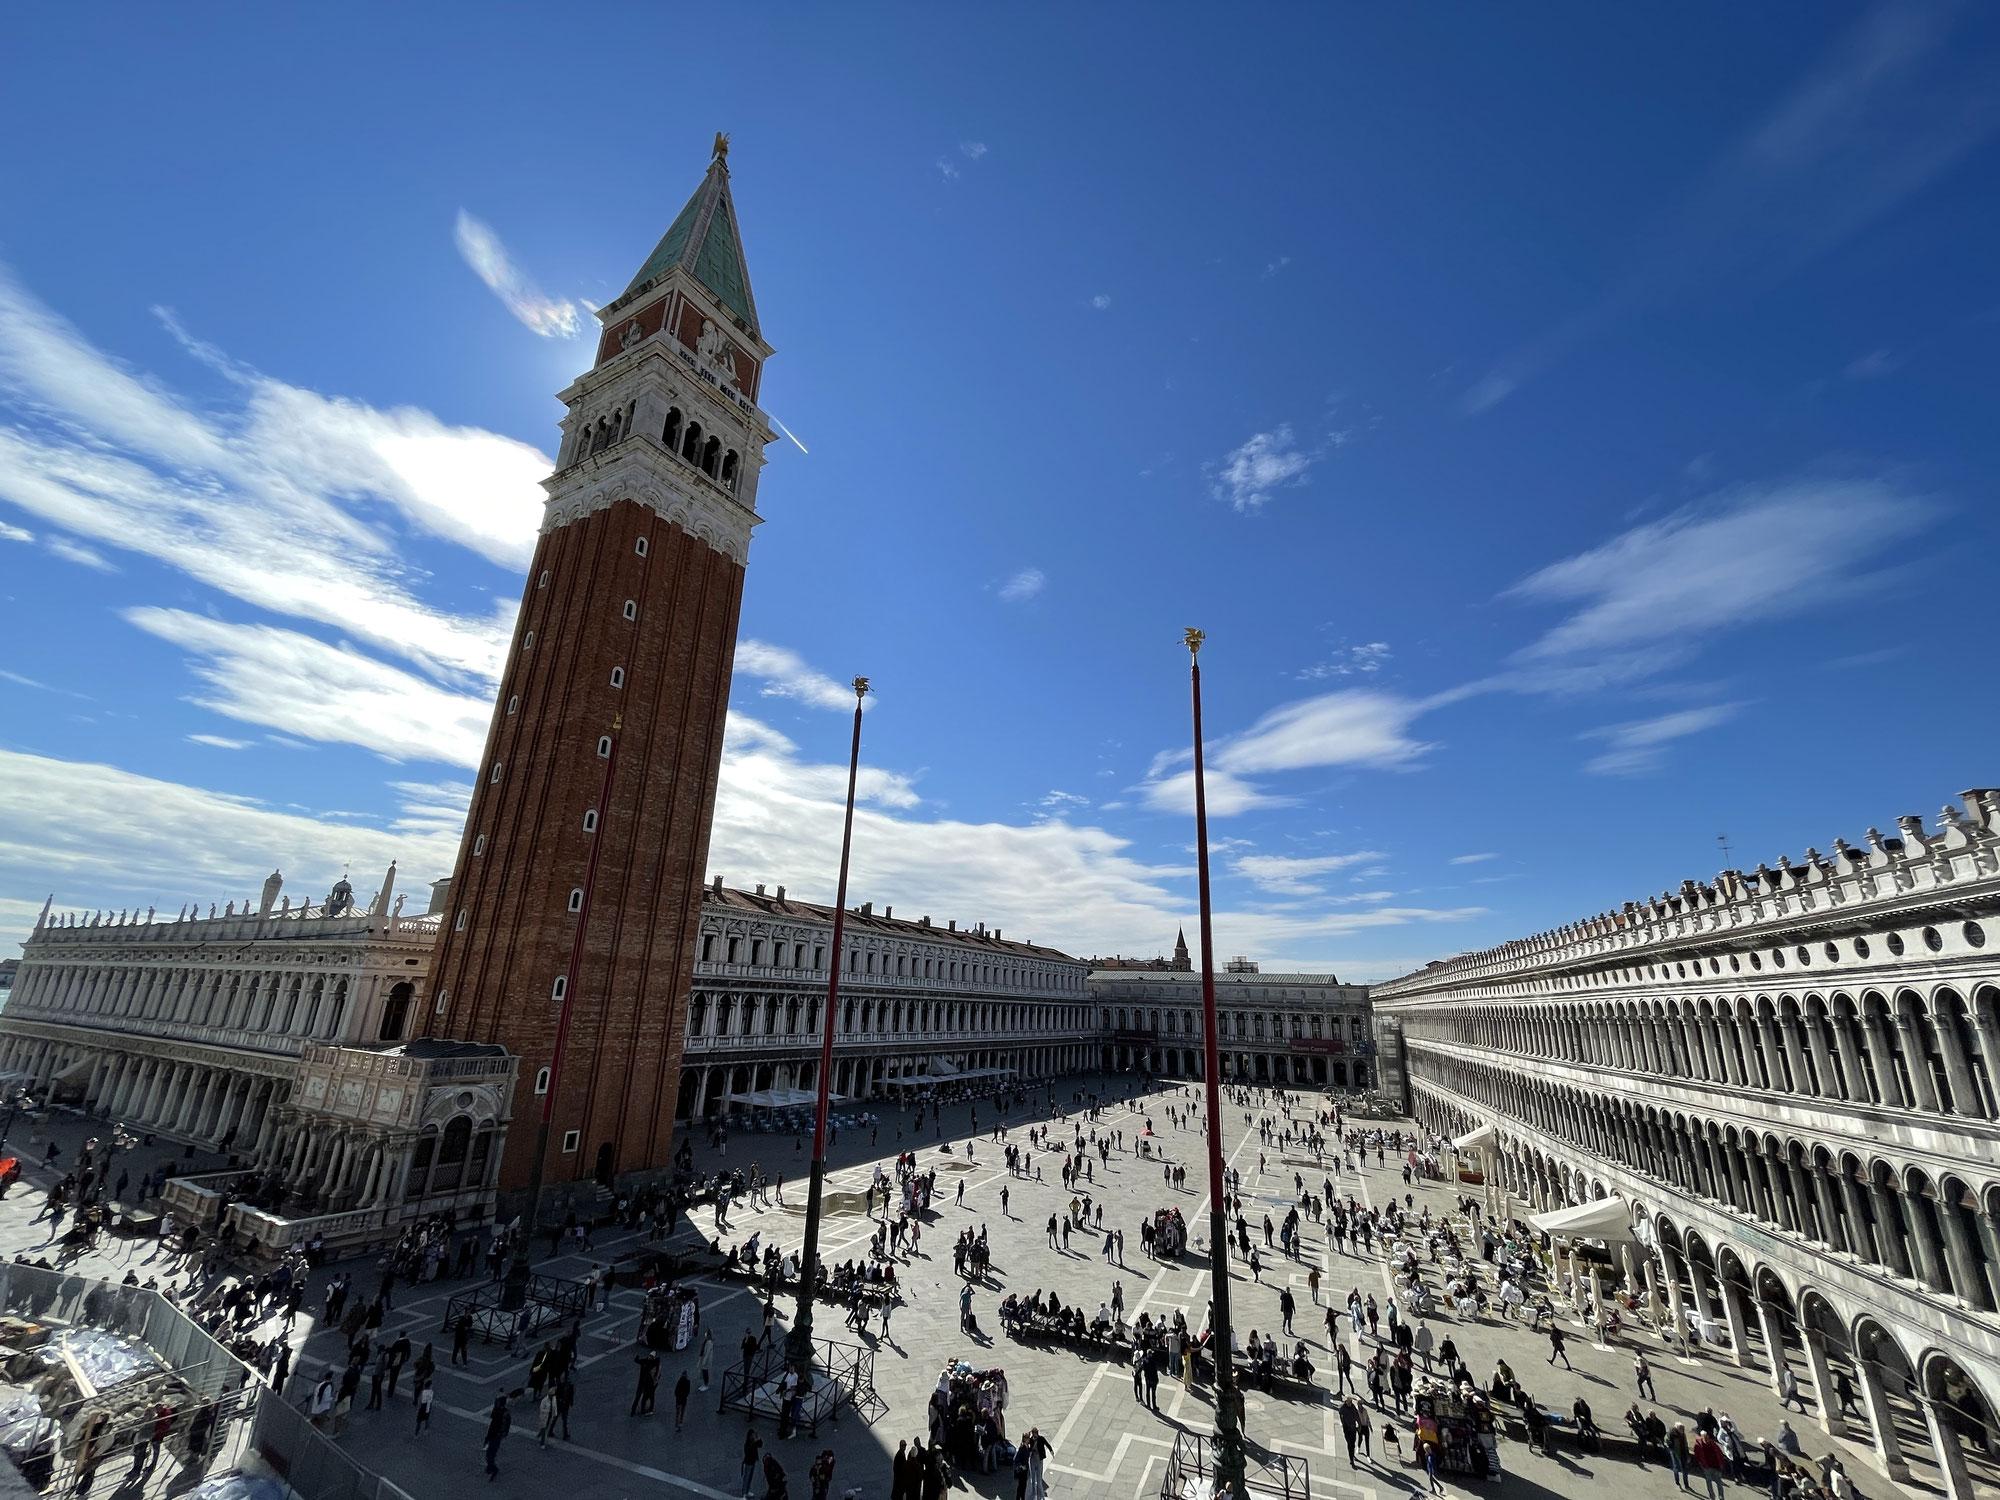 Tag 3 Venezia, Dogenpalast und Markusdom